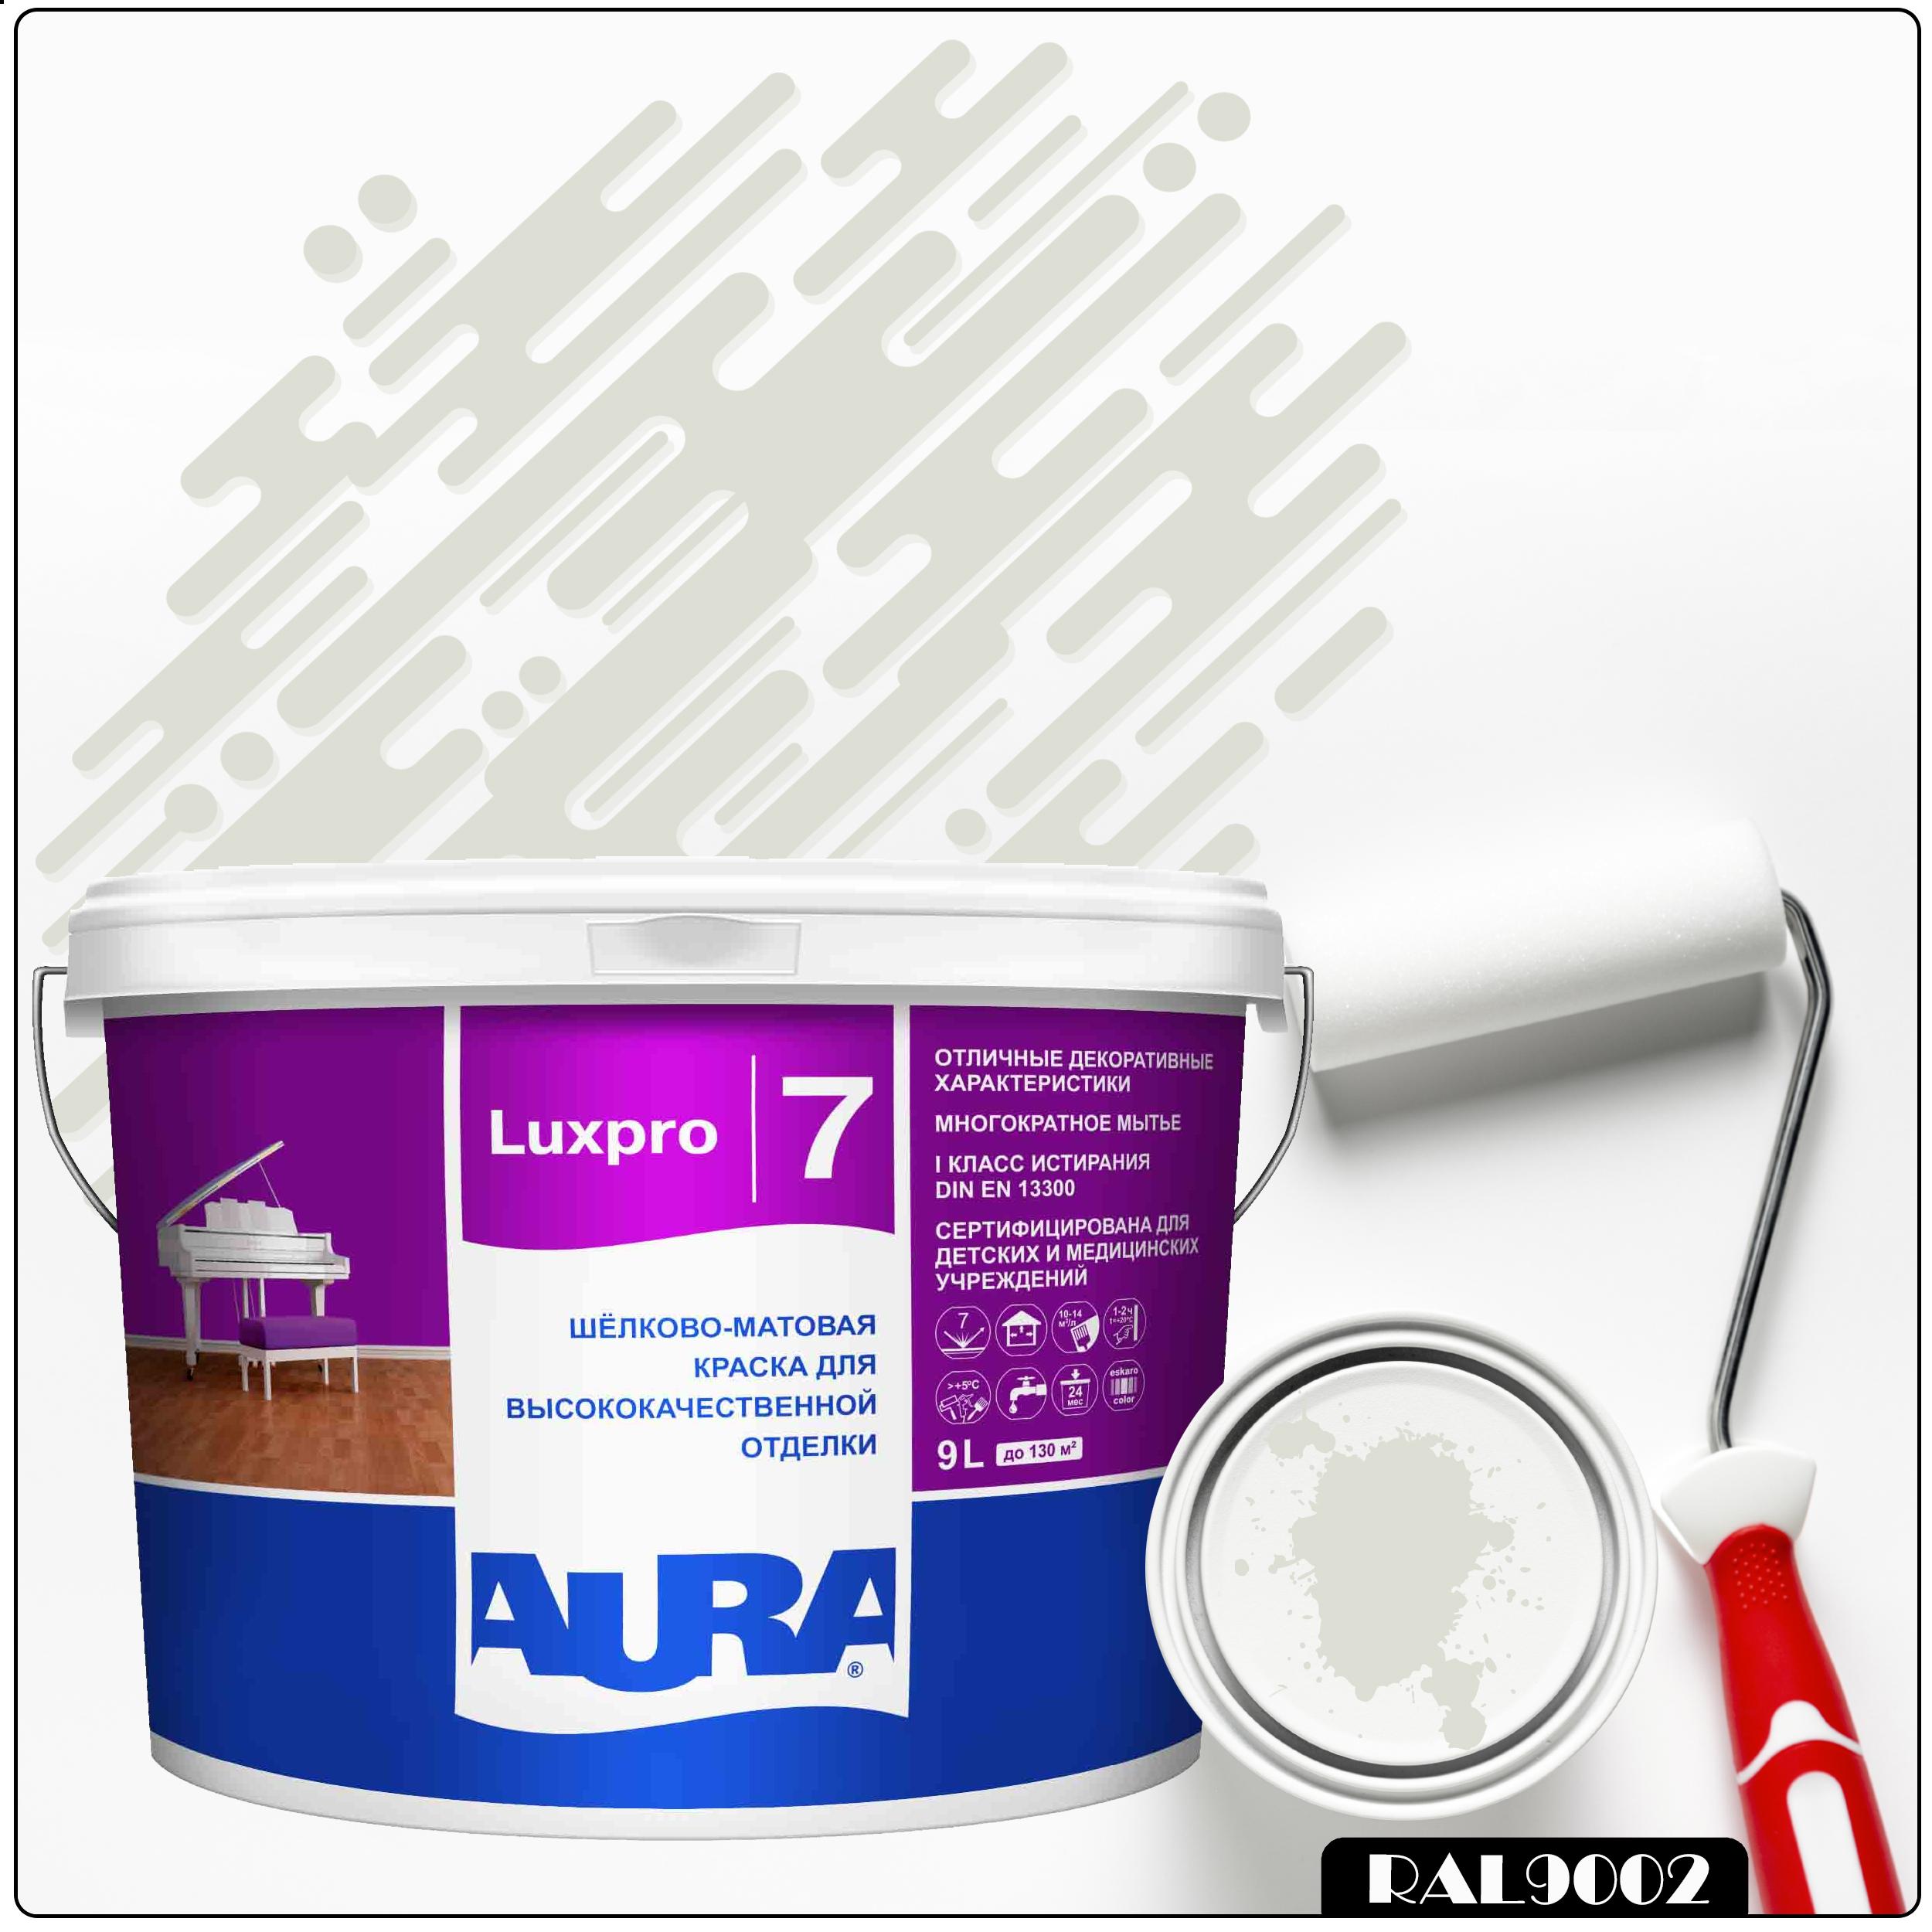 Фото 2 - Краска Aura LuxPRO 7, RAL 9002 Серо-белый, латексная, шелково-матовая, интерьерная, 9л, Аура.